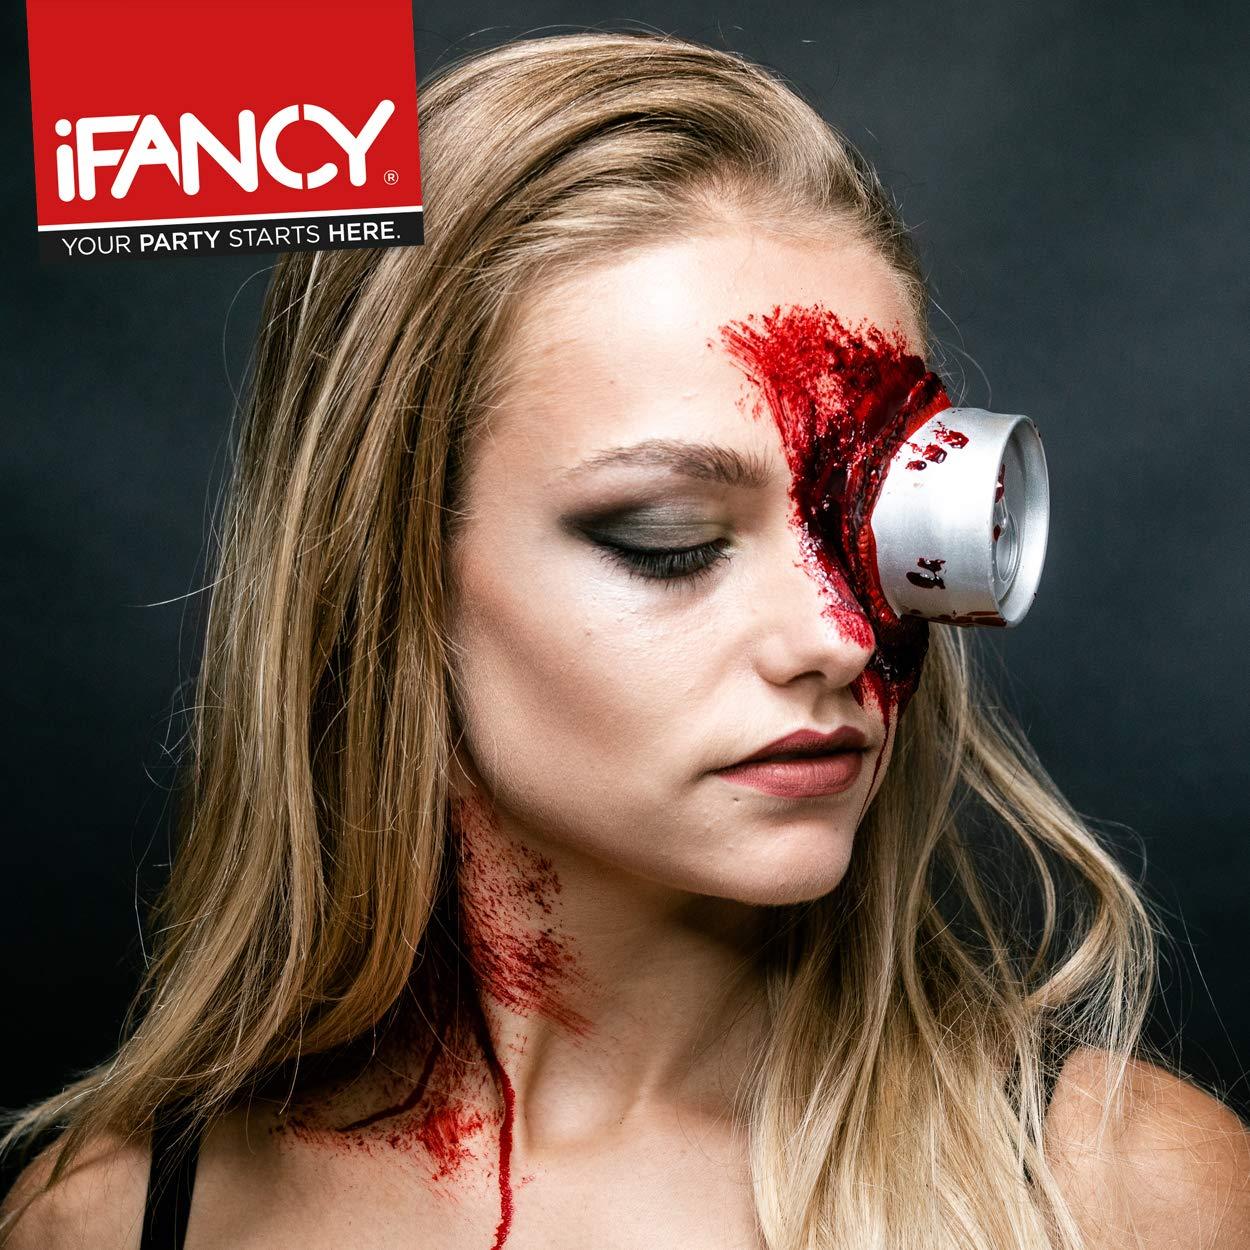 Halloween Schminkset Blutige Dose im Auge oder Kopf - Horror Makeup mit Dose, Kunstblut & Latexmilch